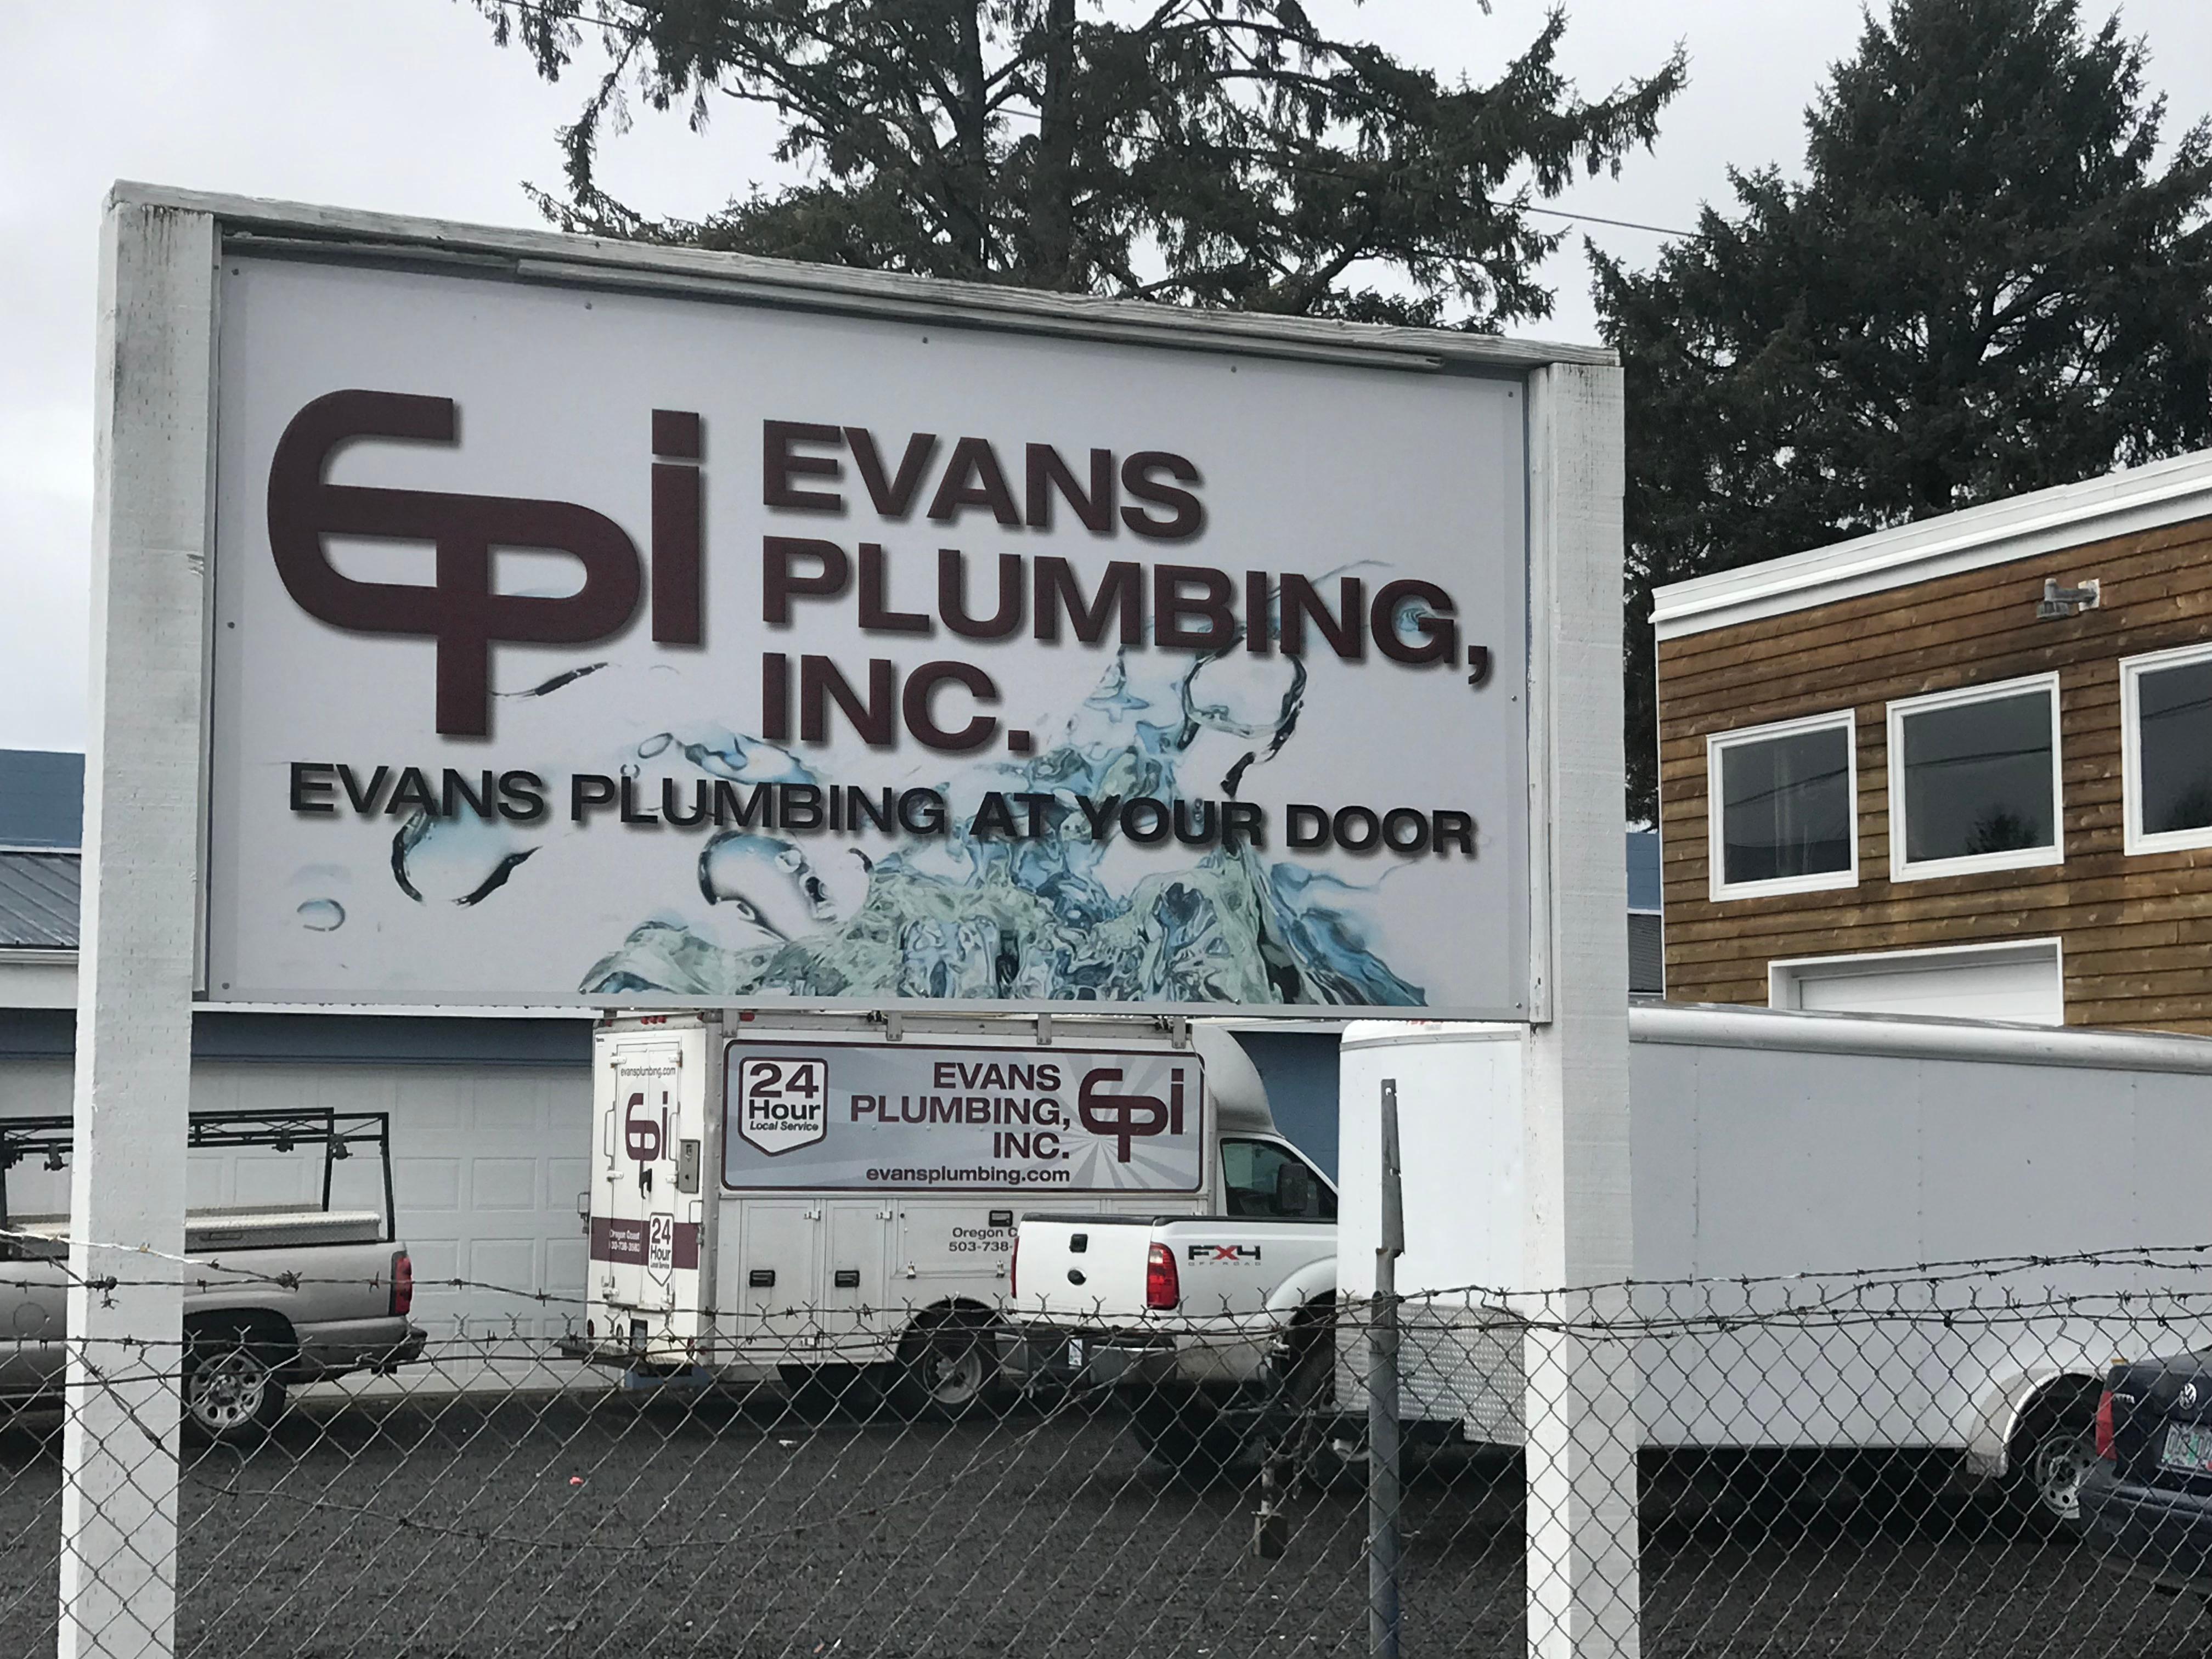 Evans Plumbing Inc image 1